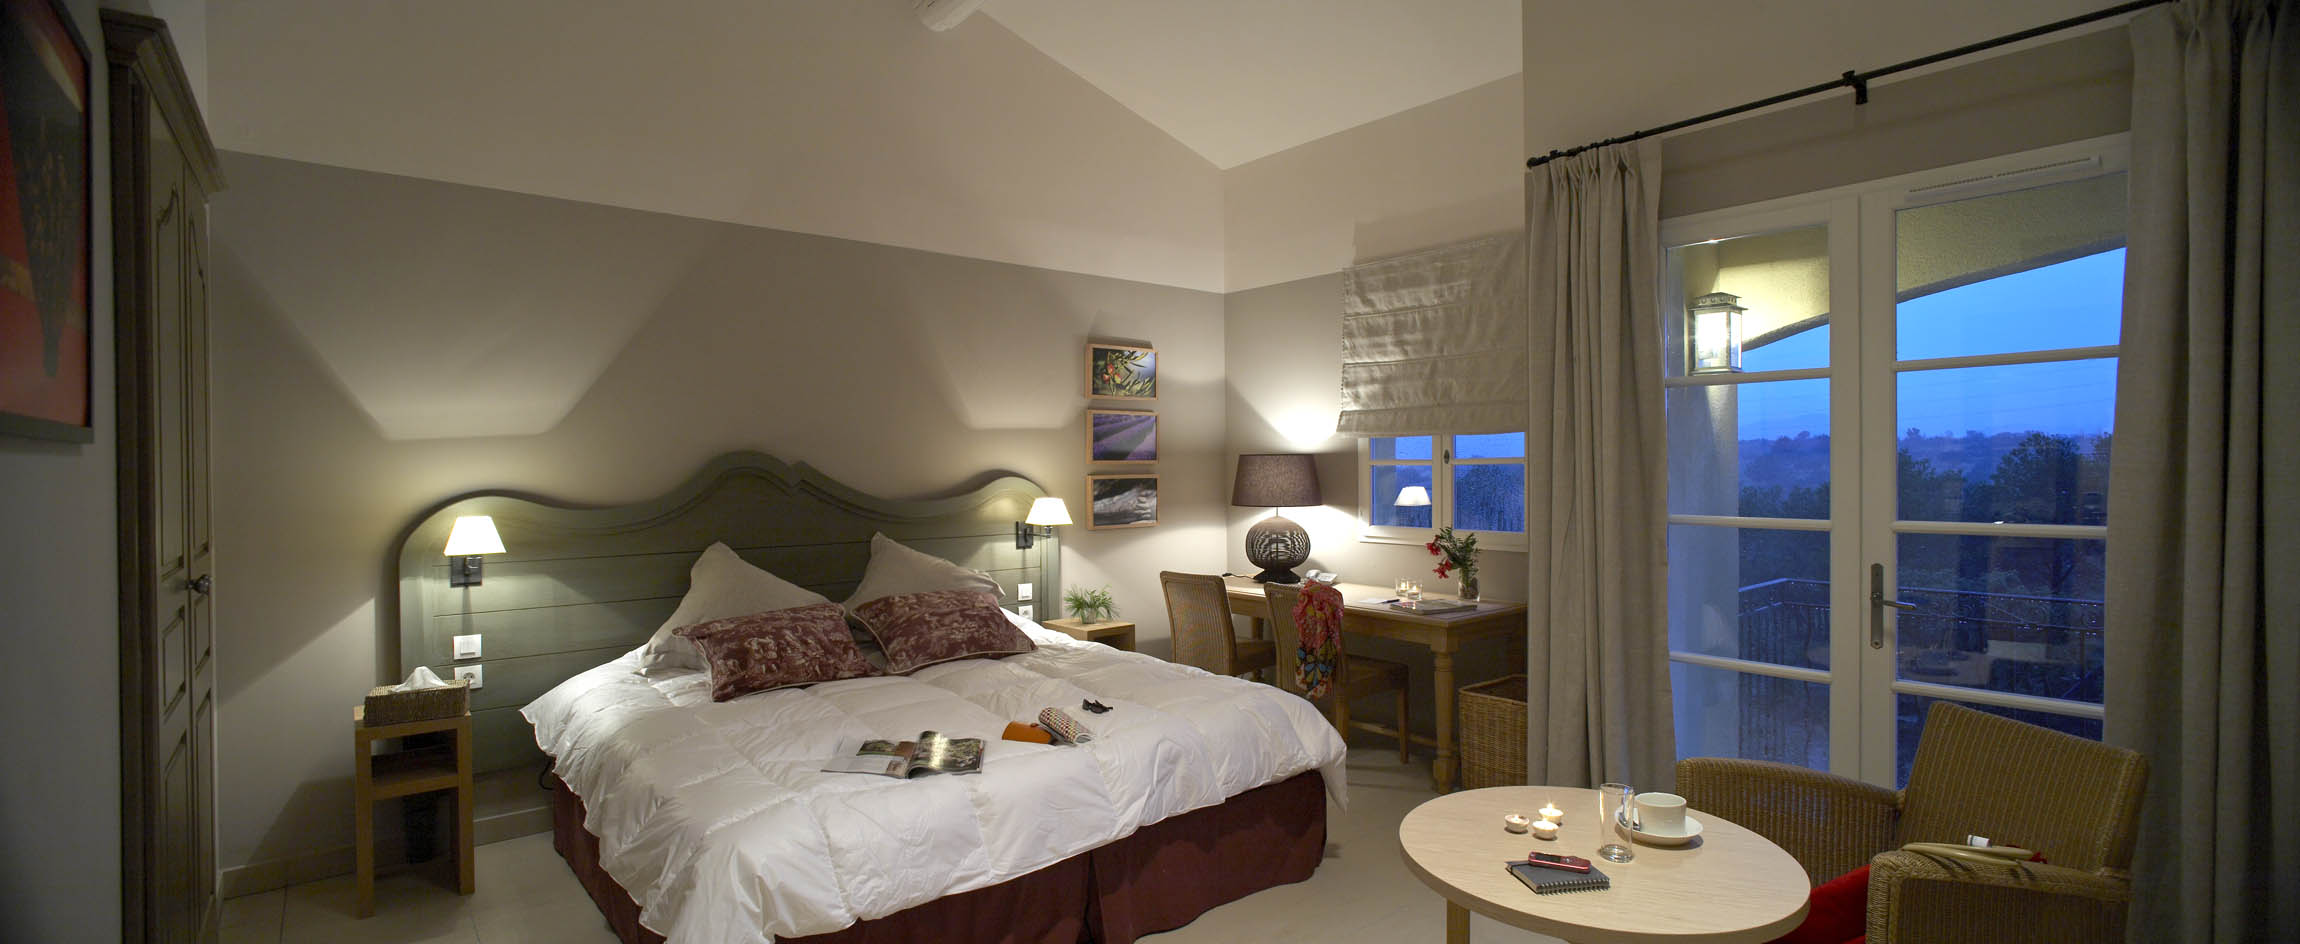 golf-expedition-golf-reizen-frankrijk-regio-cote-d'azur-Les-Domaines-de-Saint-Endréol-Golf-en-Spa-Resort-luxe-slaapkamer-met-balkon